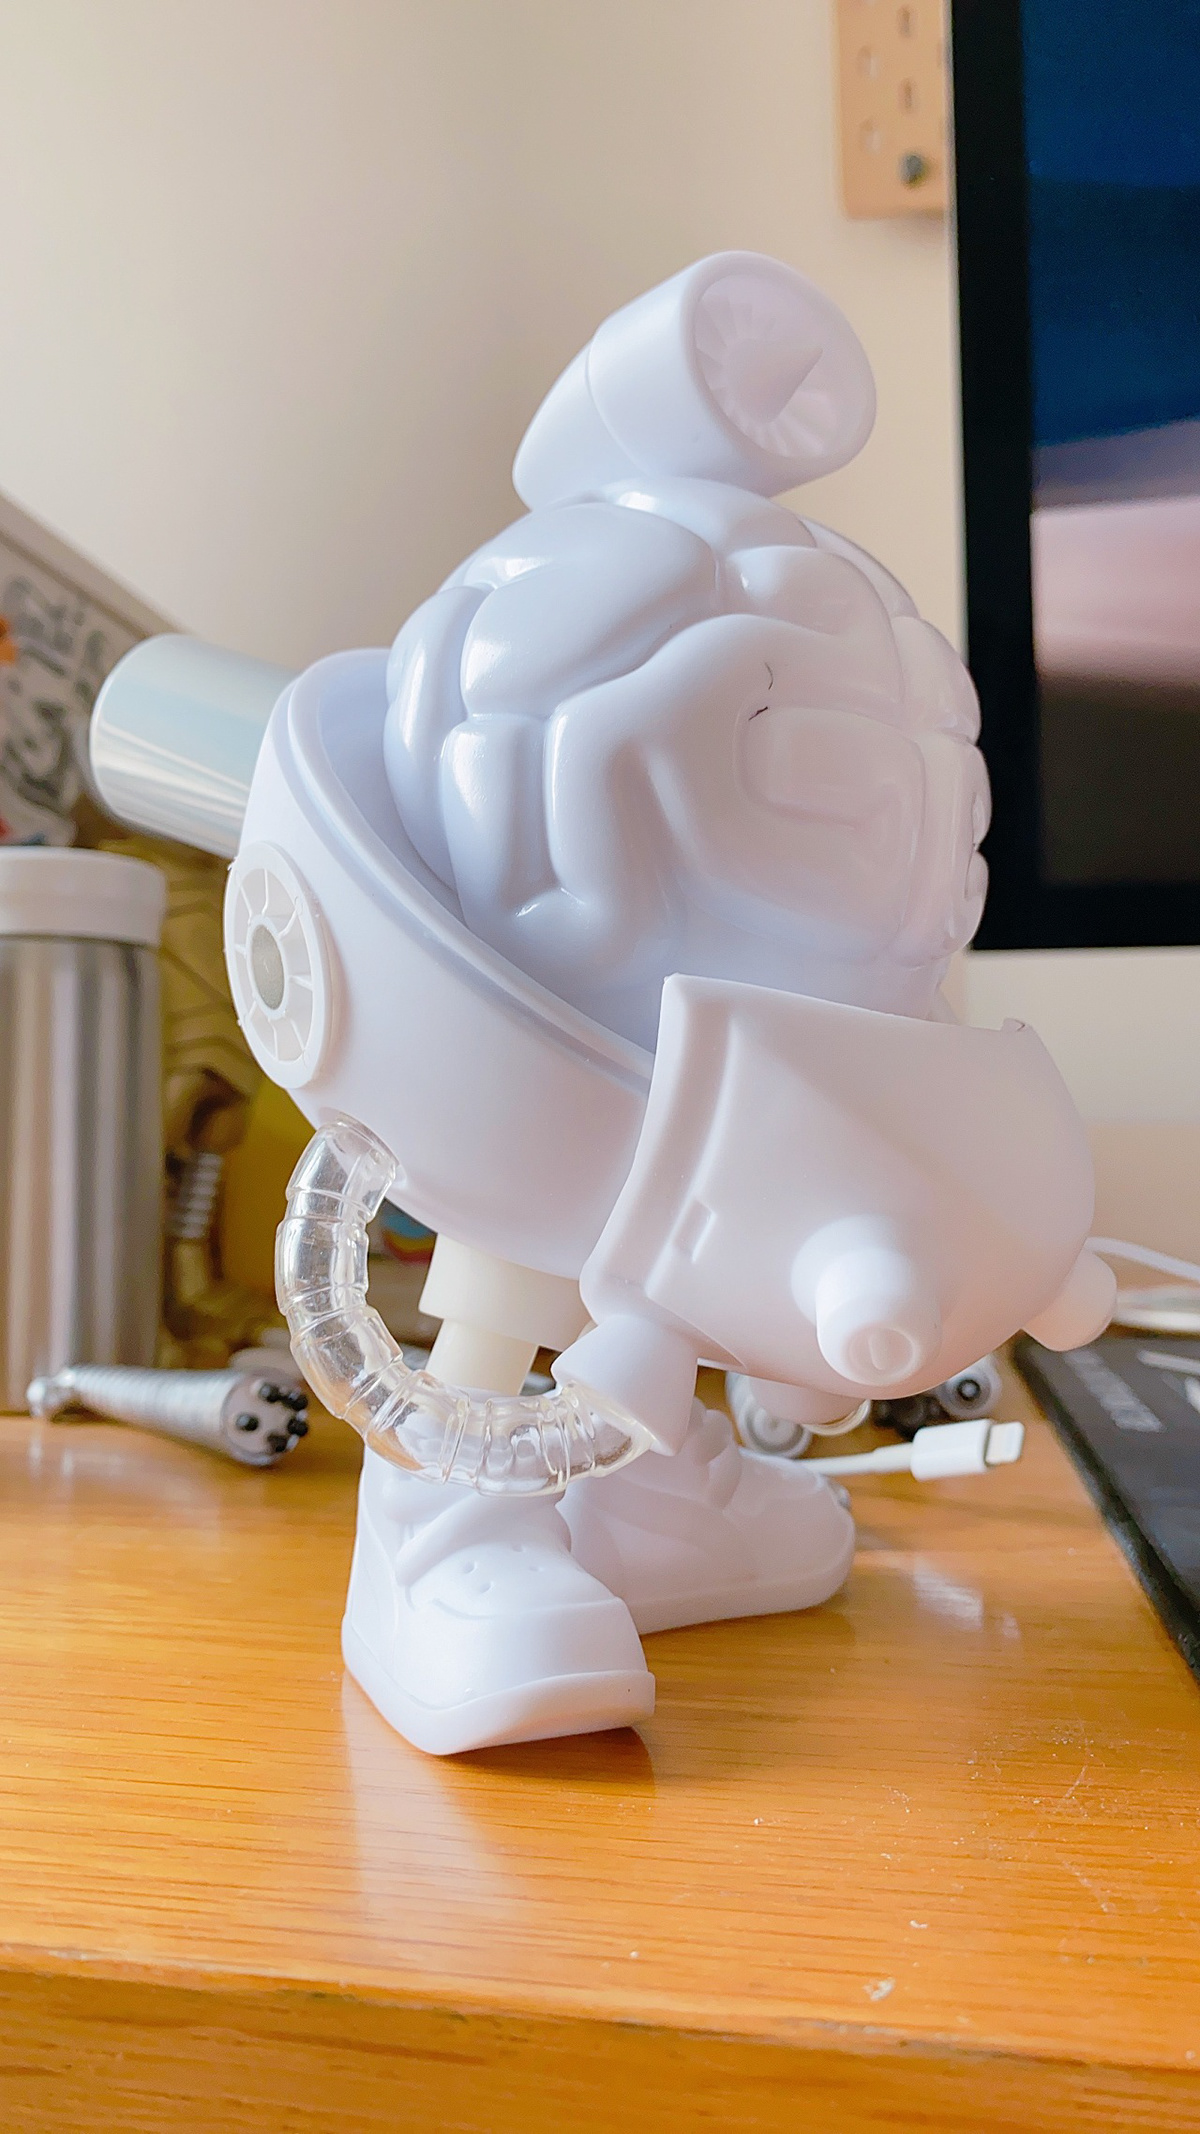 x-cross 大力 机器人 玩具 脑子 脑电波 腾讯